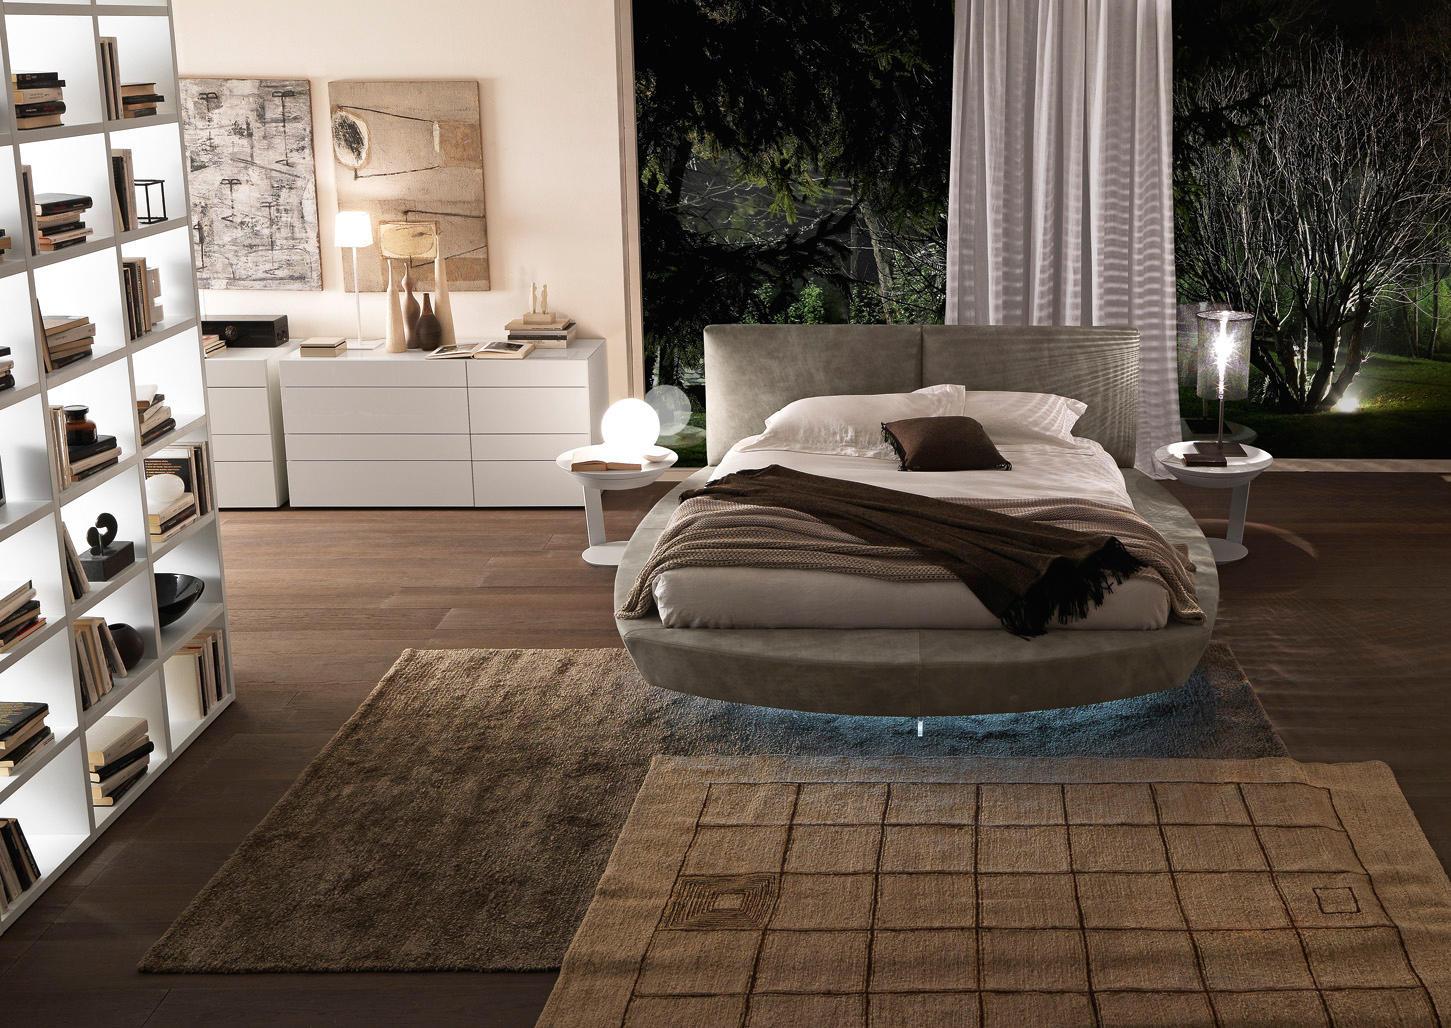 ZERO_SIZE S BETT - Betten von Presotto | Architonic